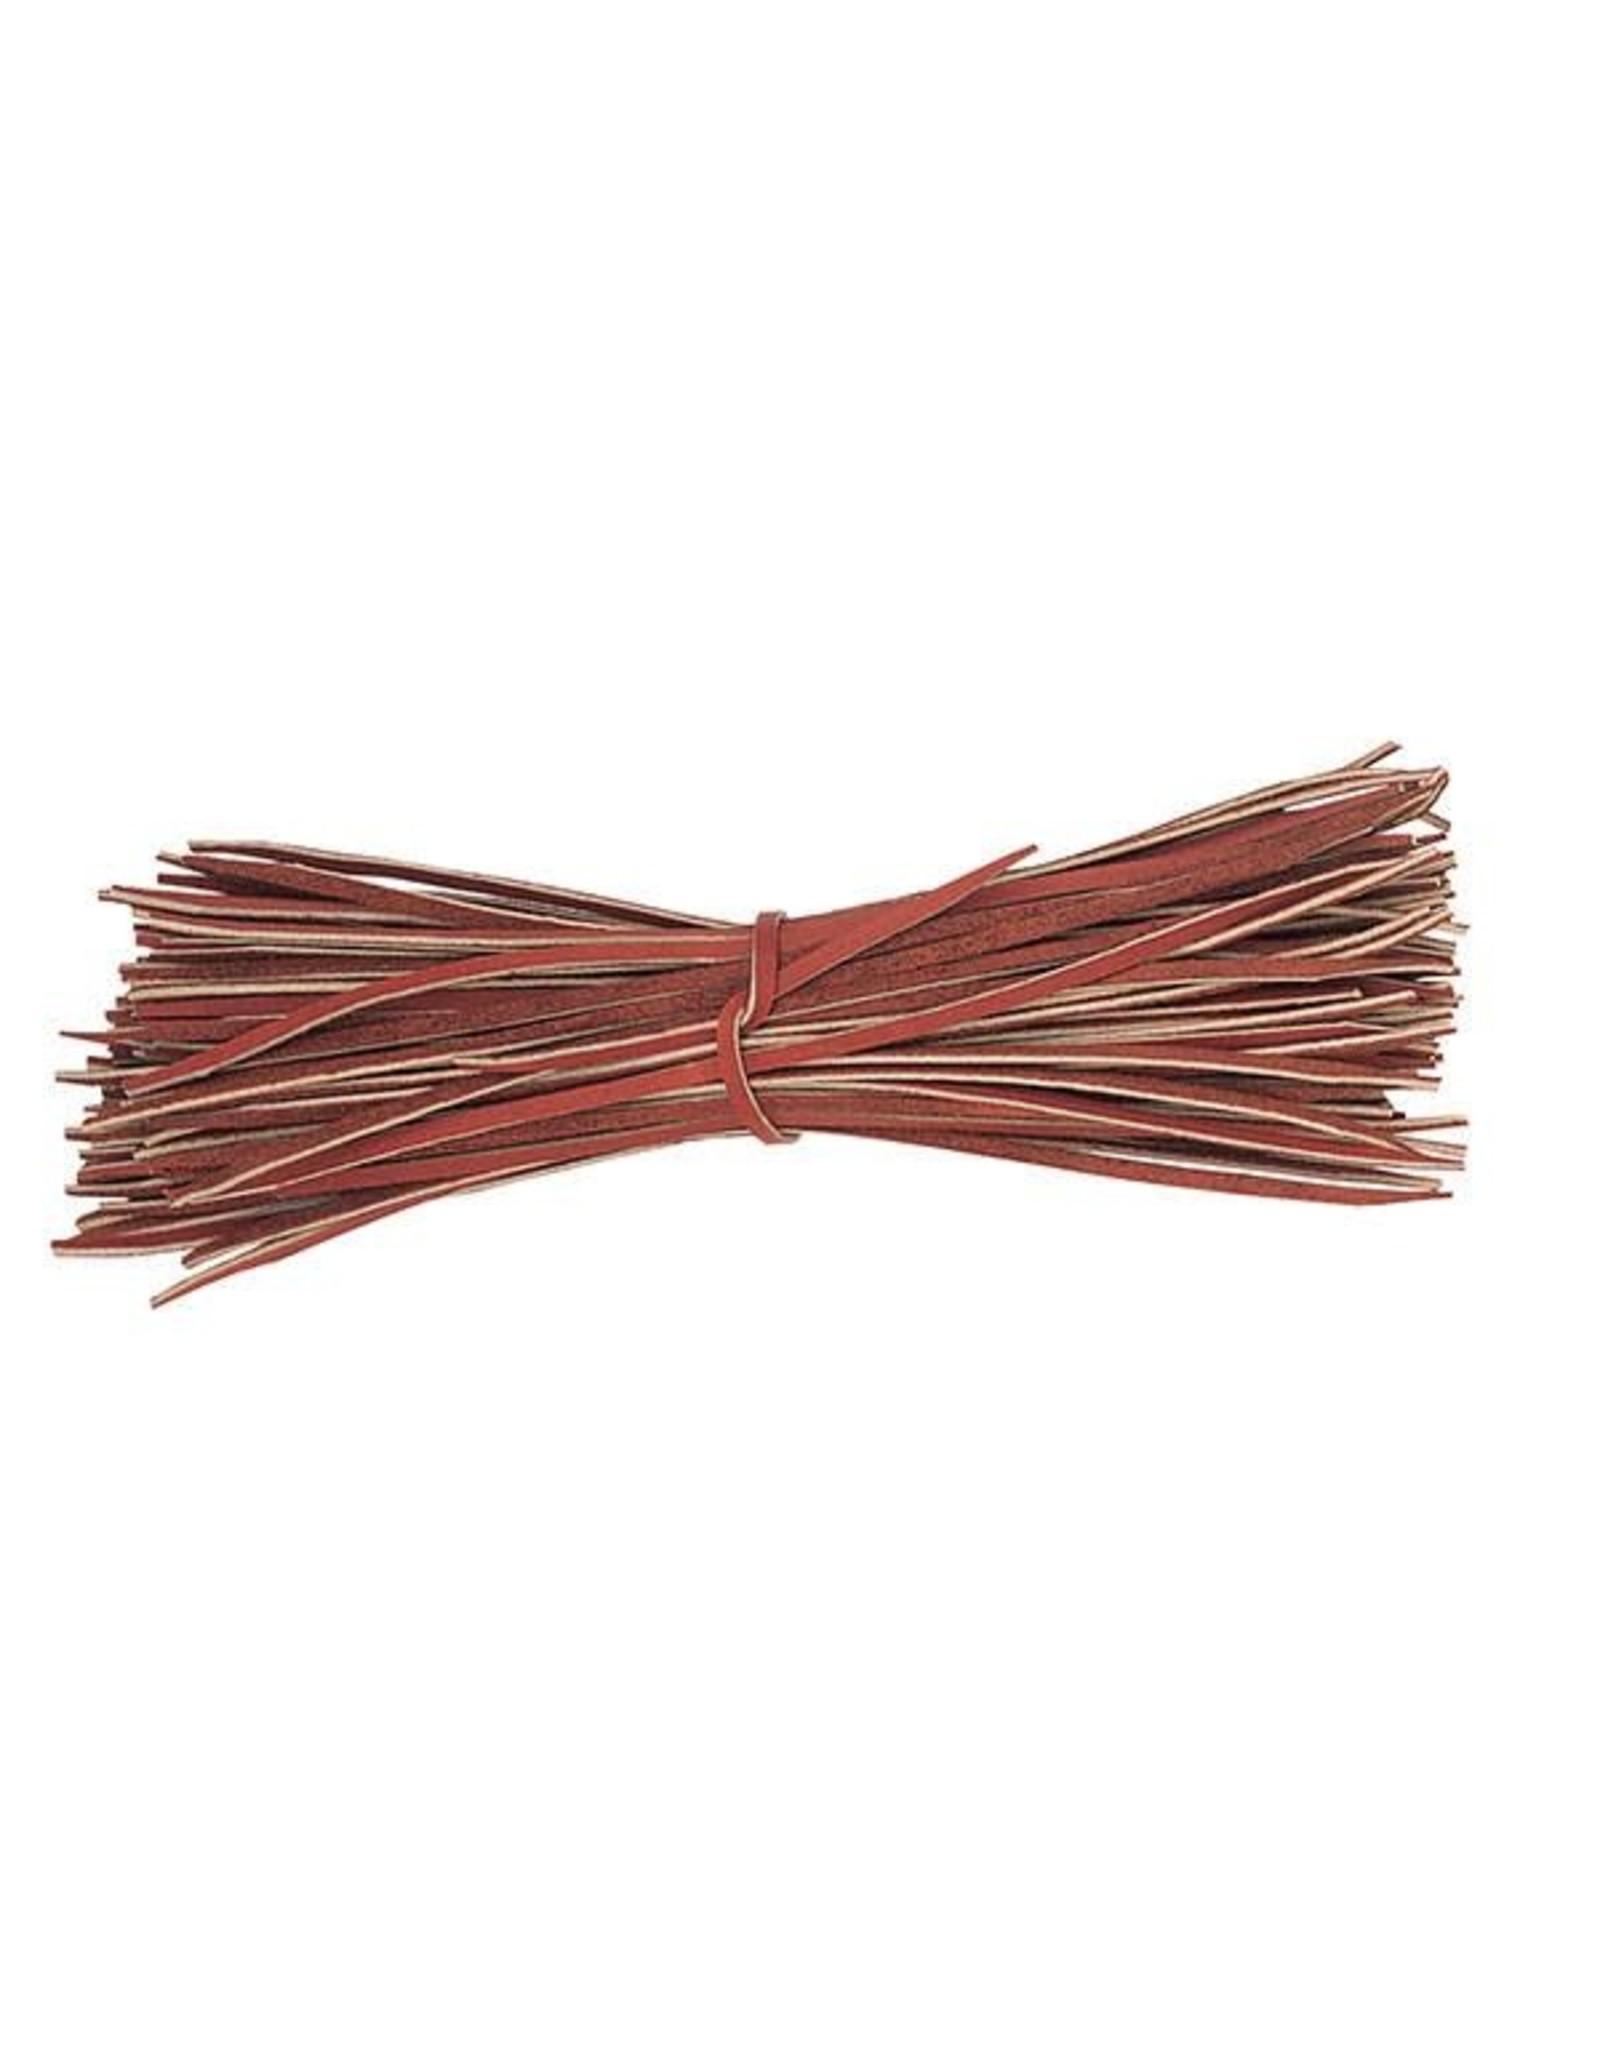 "Weaver Leather Lace Tie Burgandy 3/16"" X 12"""